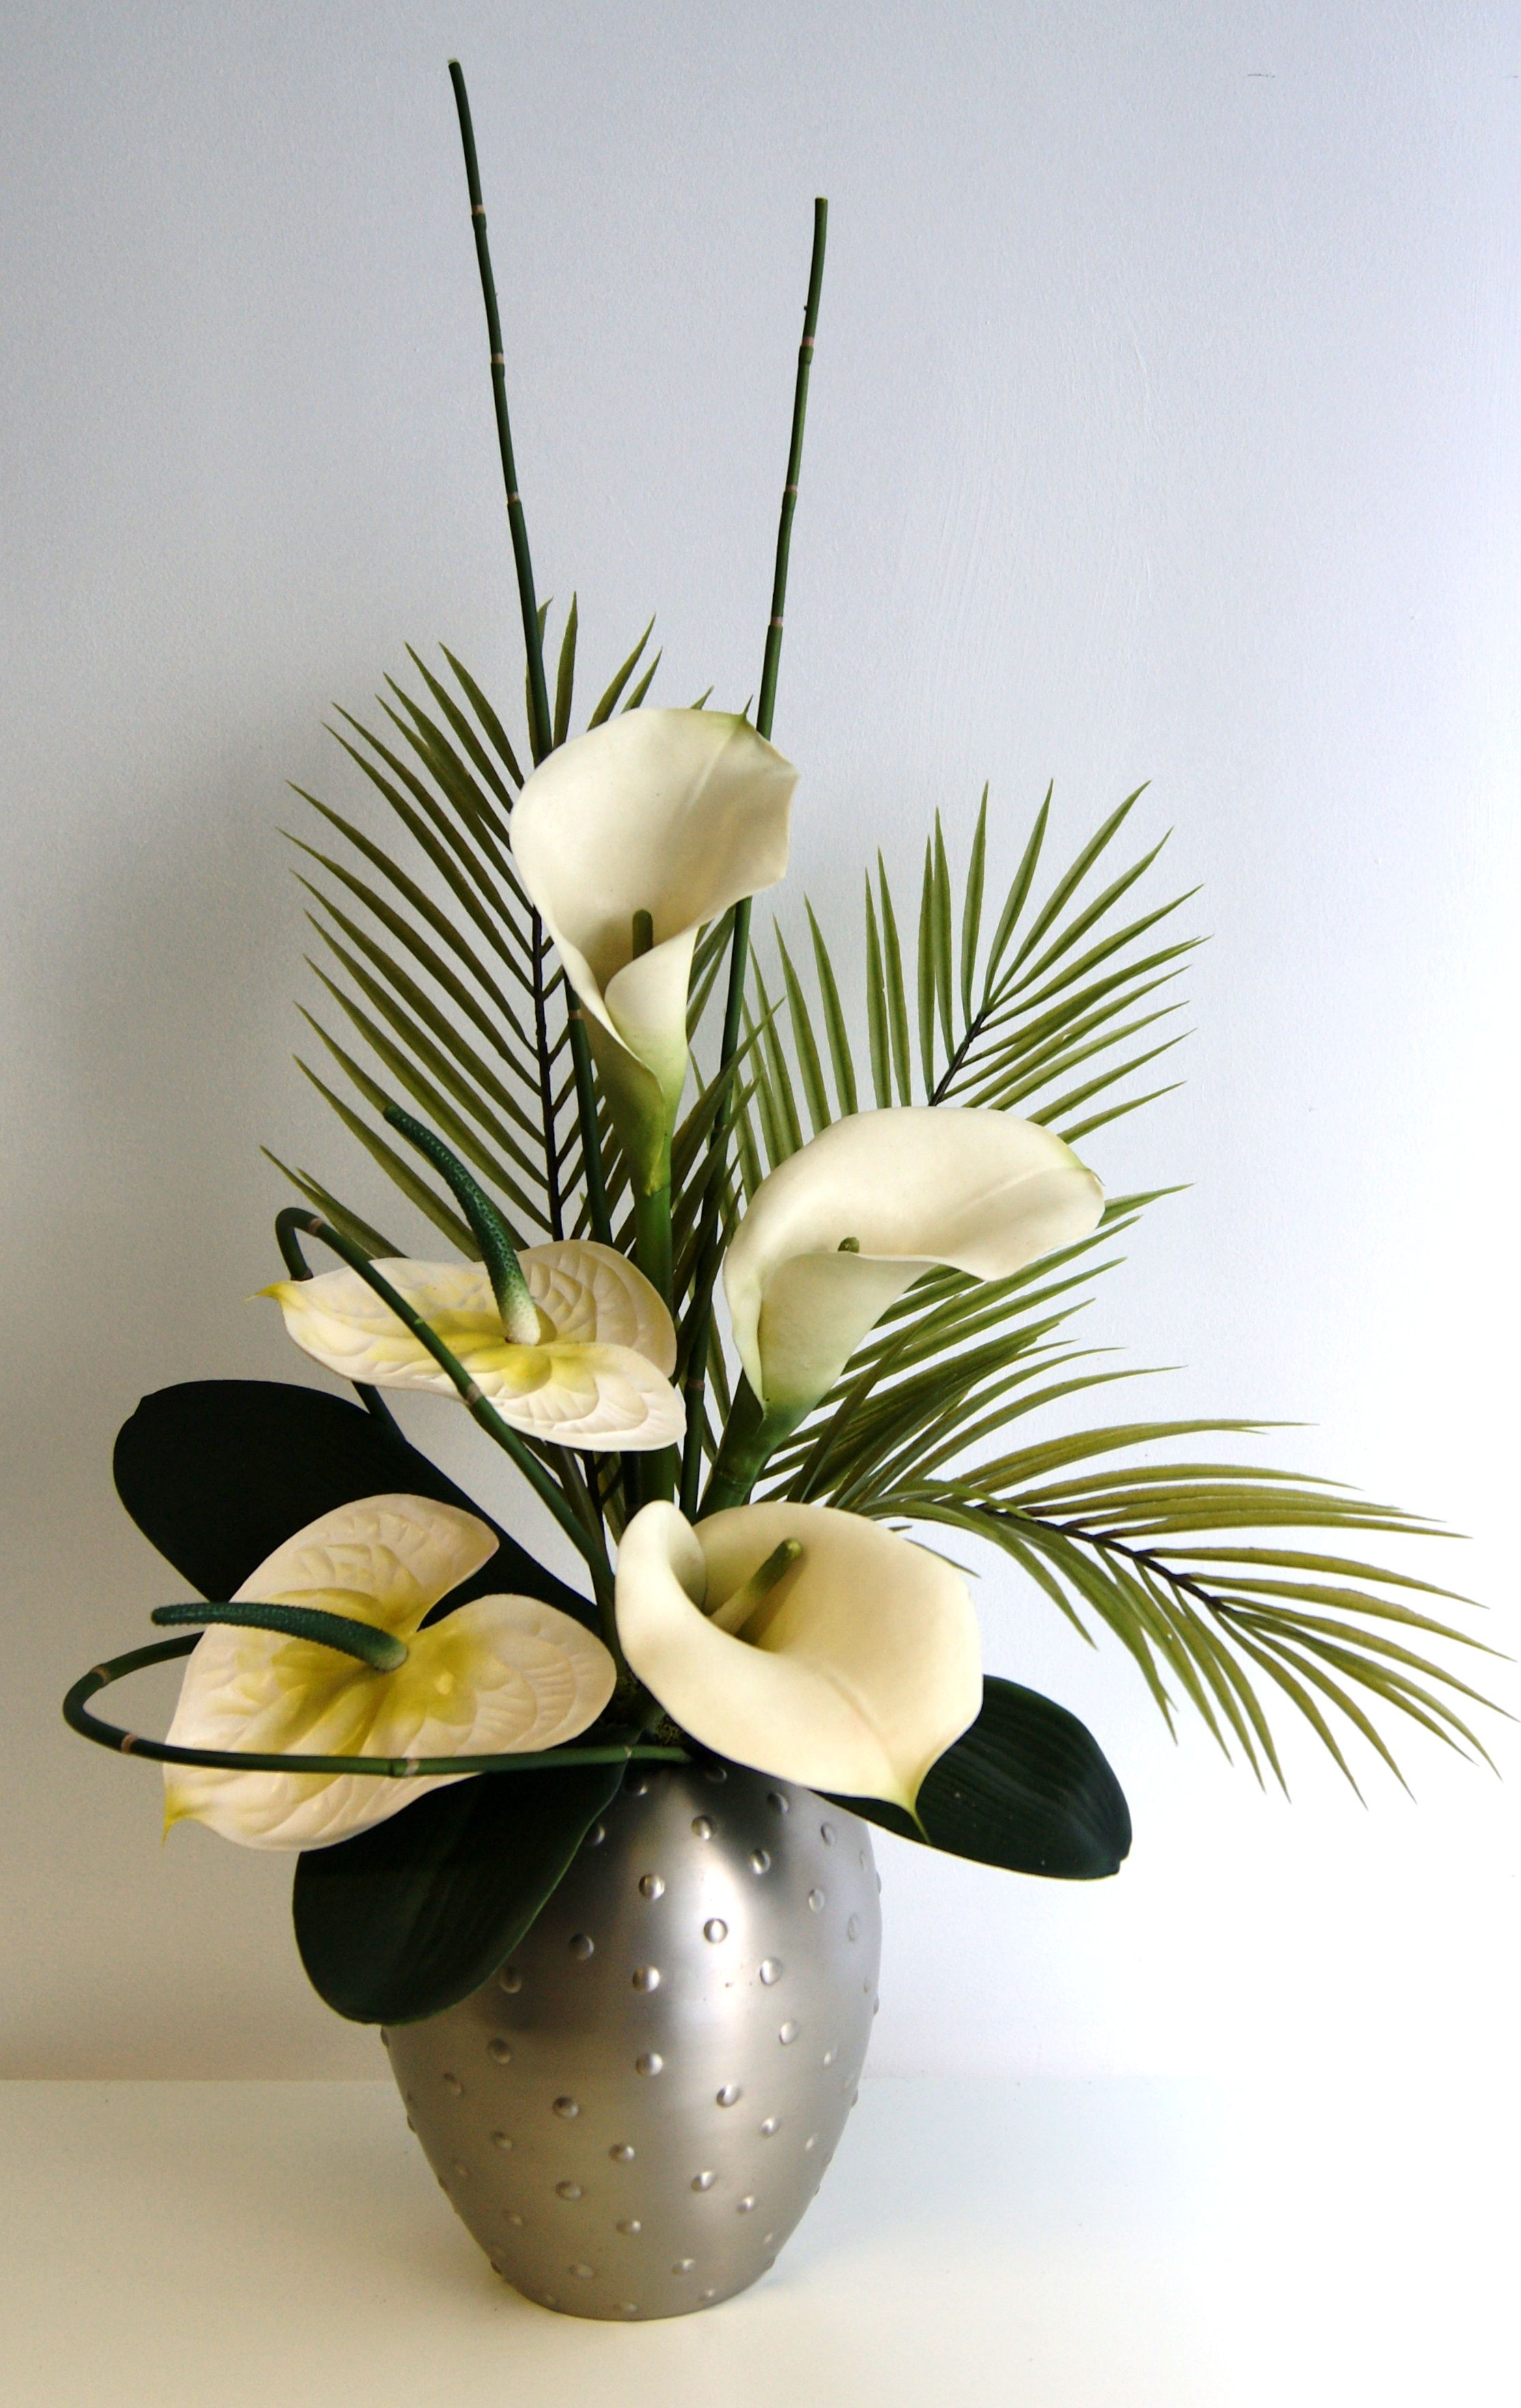 Ginger lily floral design ivory and green arrangement with ginger lily floral design ivory and green arrangement with calla lilies and anthurium dhlflorist Images